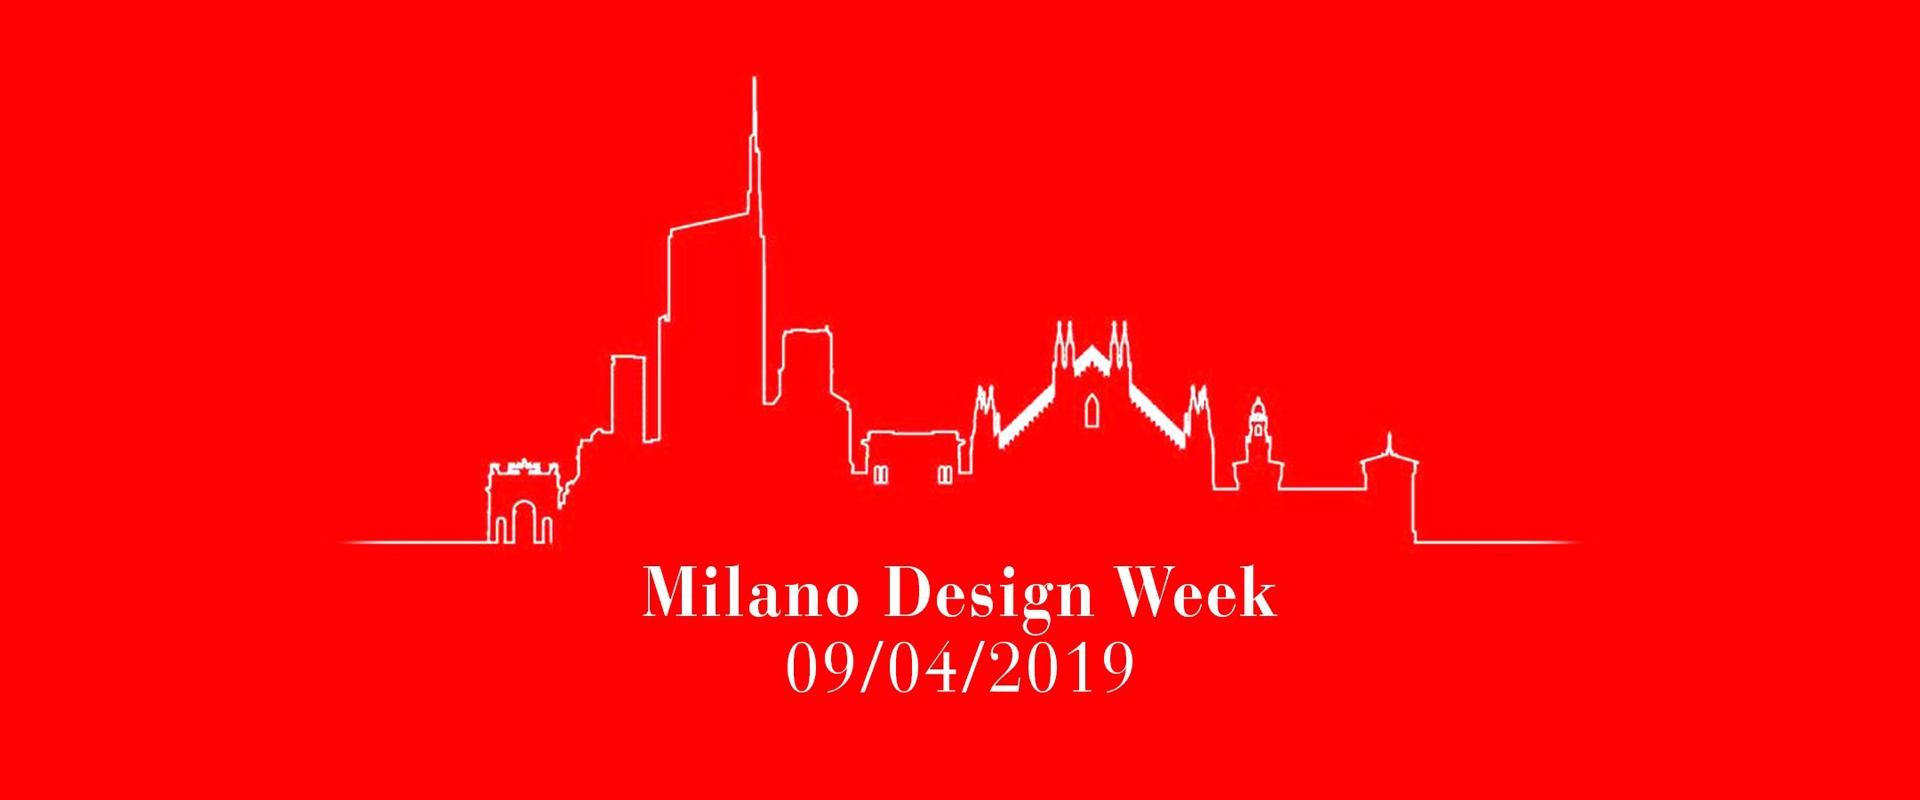 Milano Design Week 2019. Immergiti nell'atmosfera ekinex